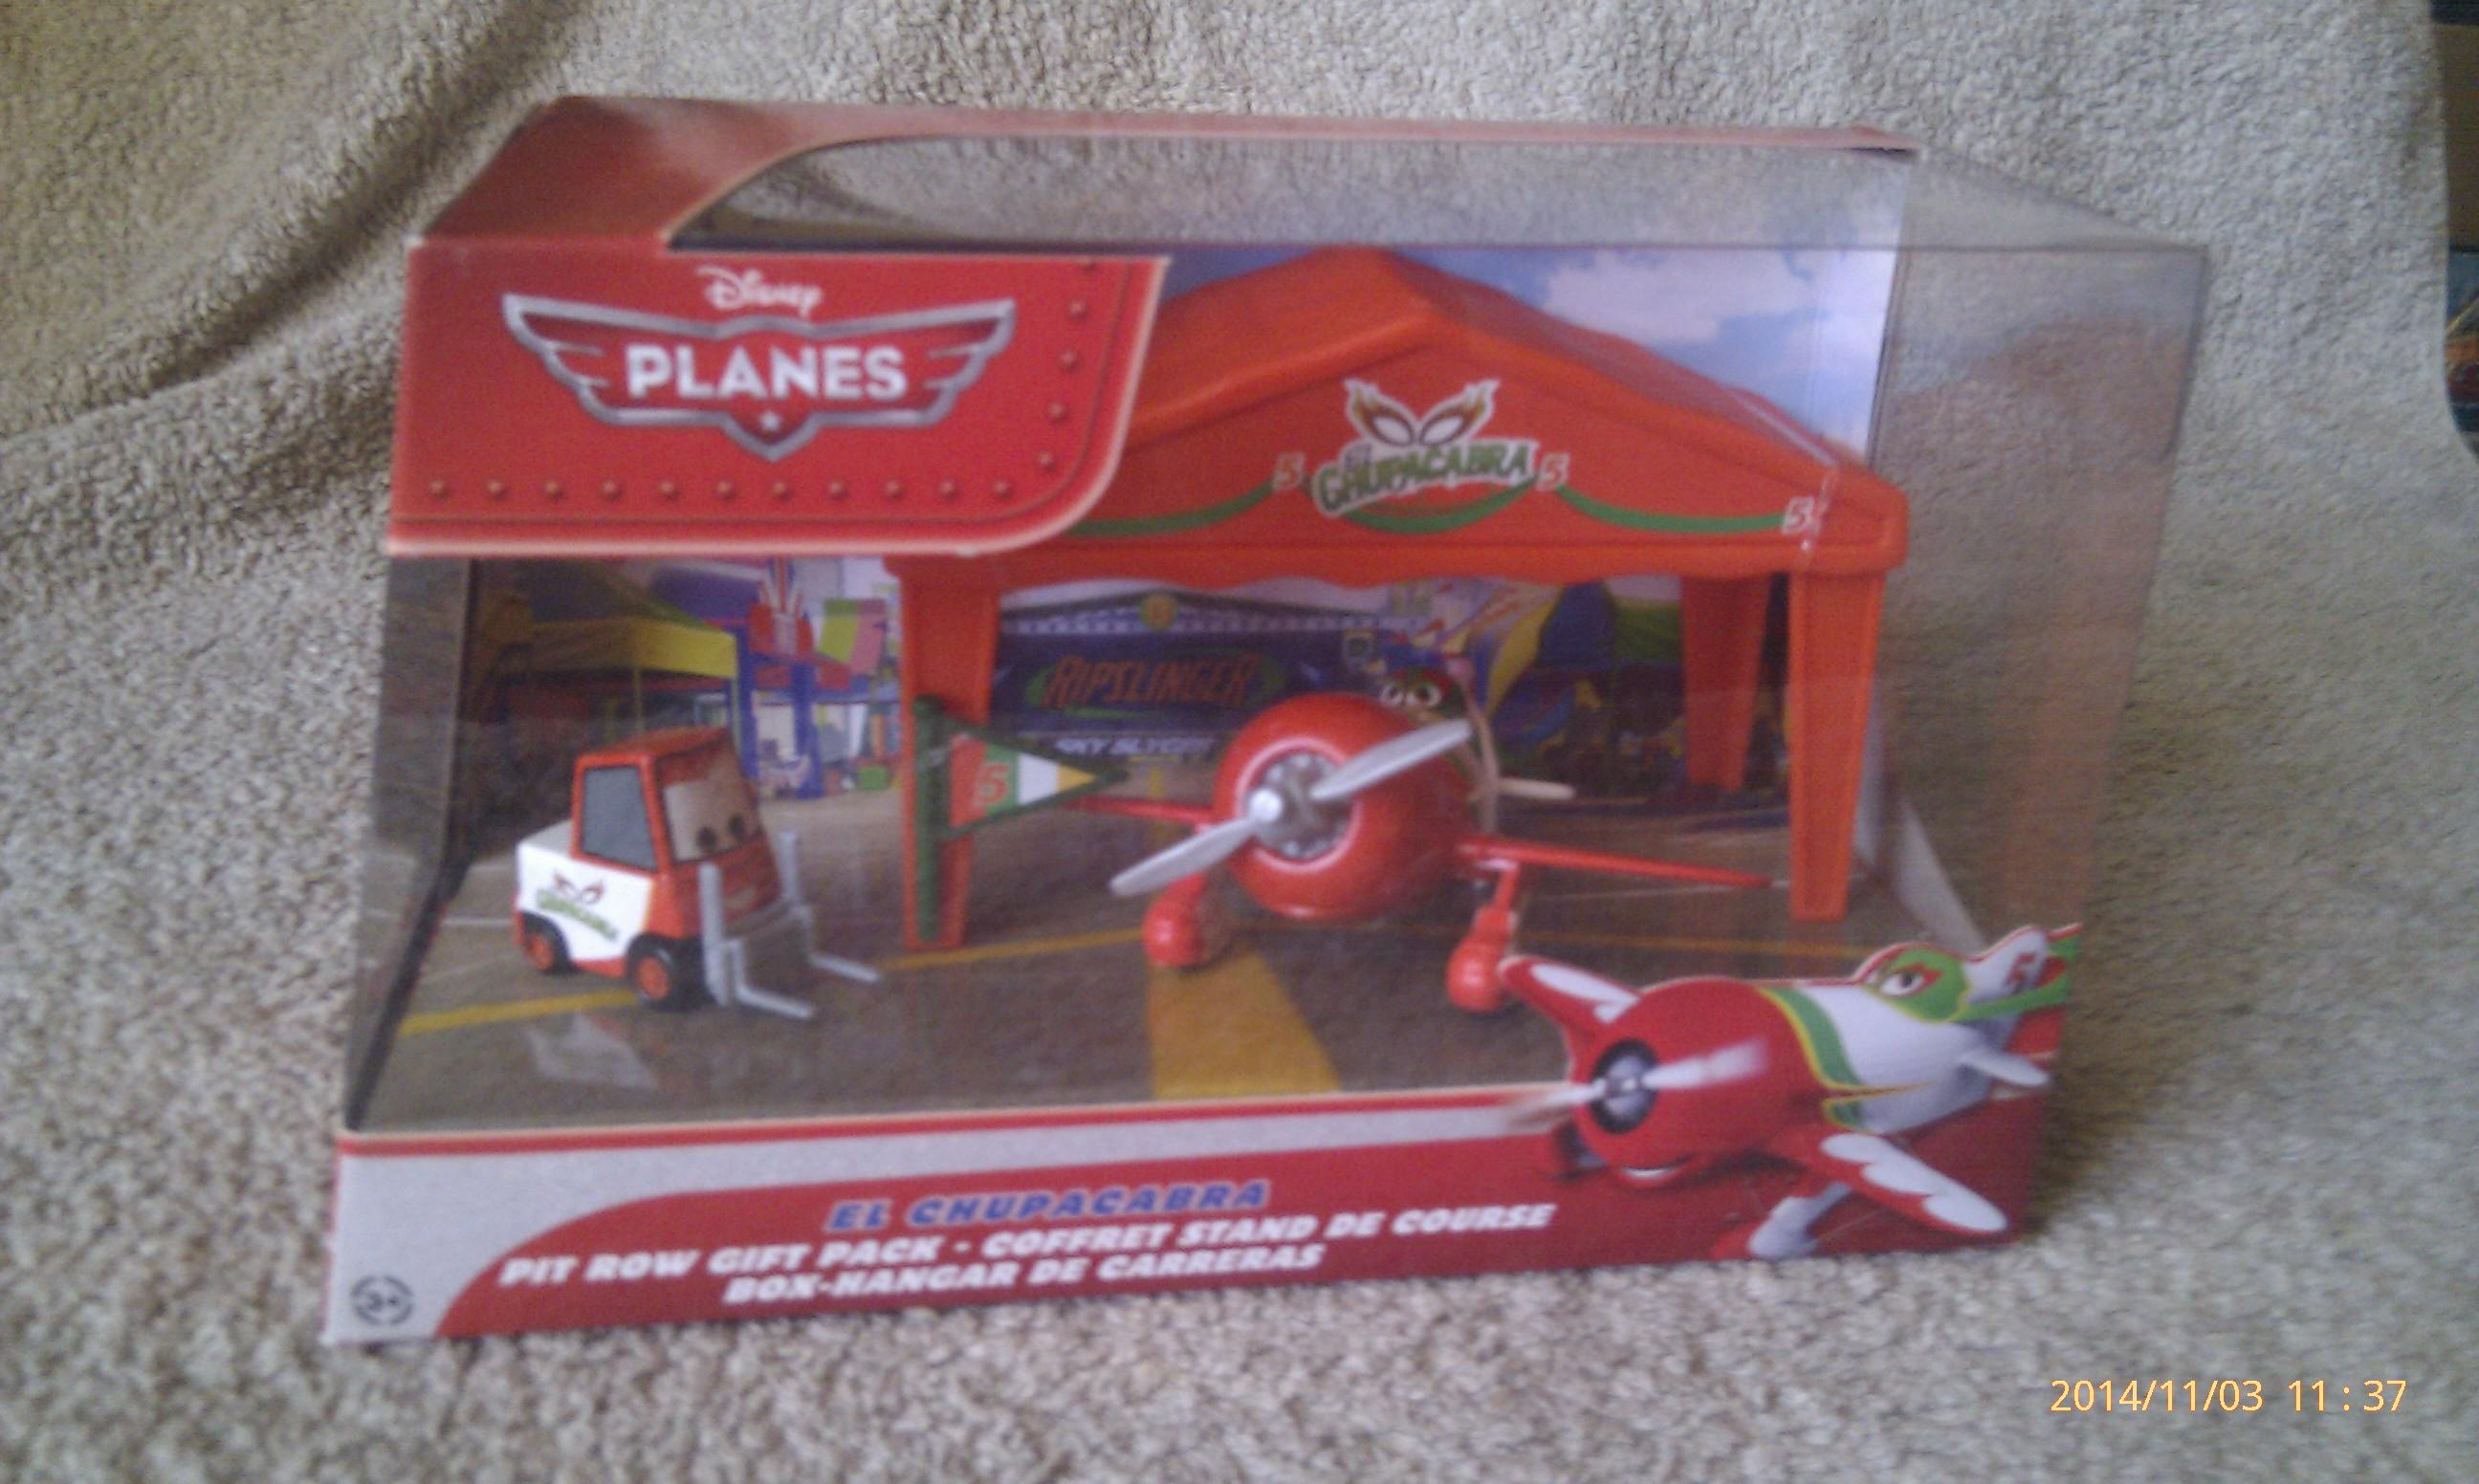 Disney Planes - El Chupacabra - Pit Row Gift Pack